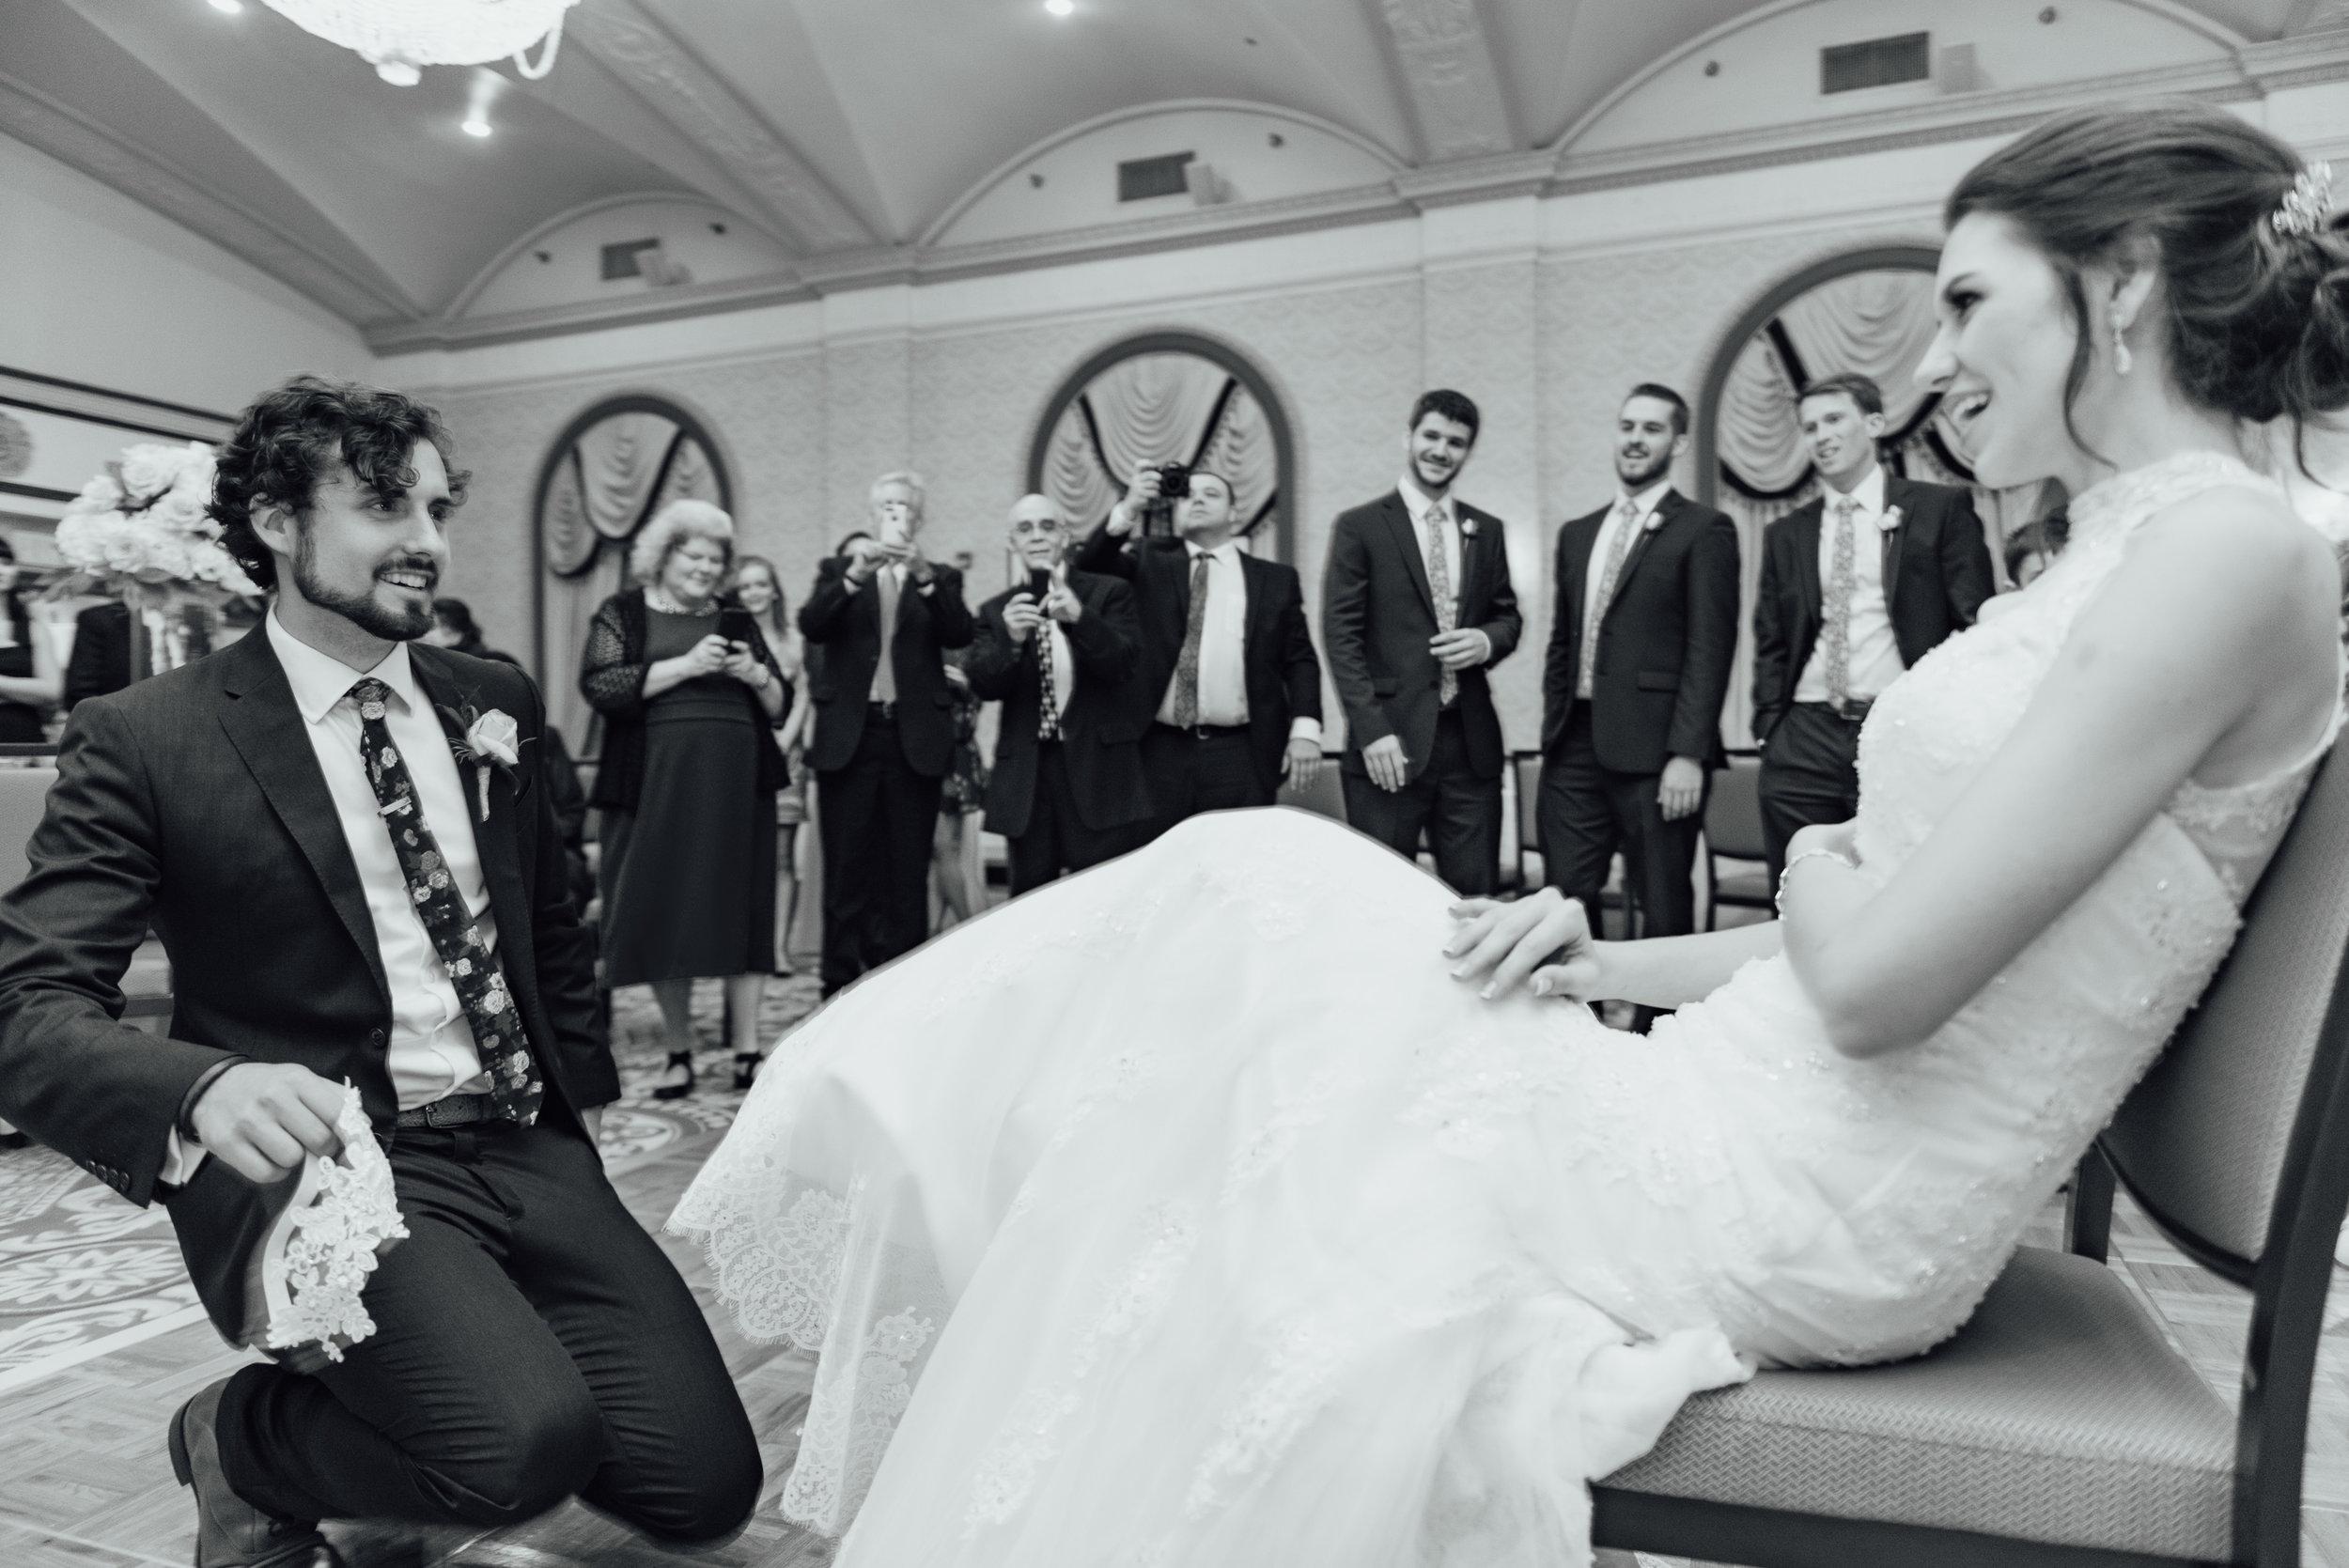 cleland-studios-wedding-photography-72.jpg